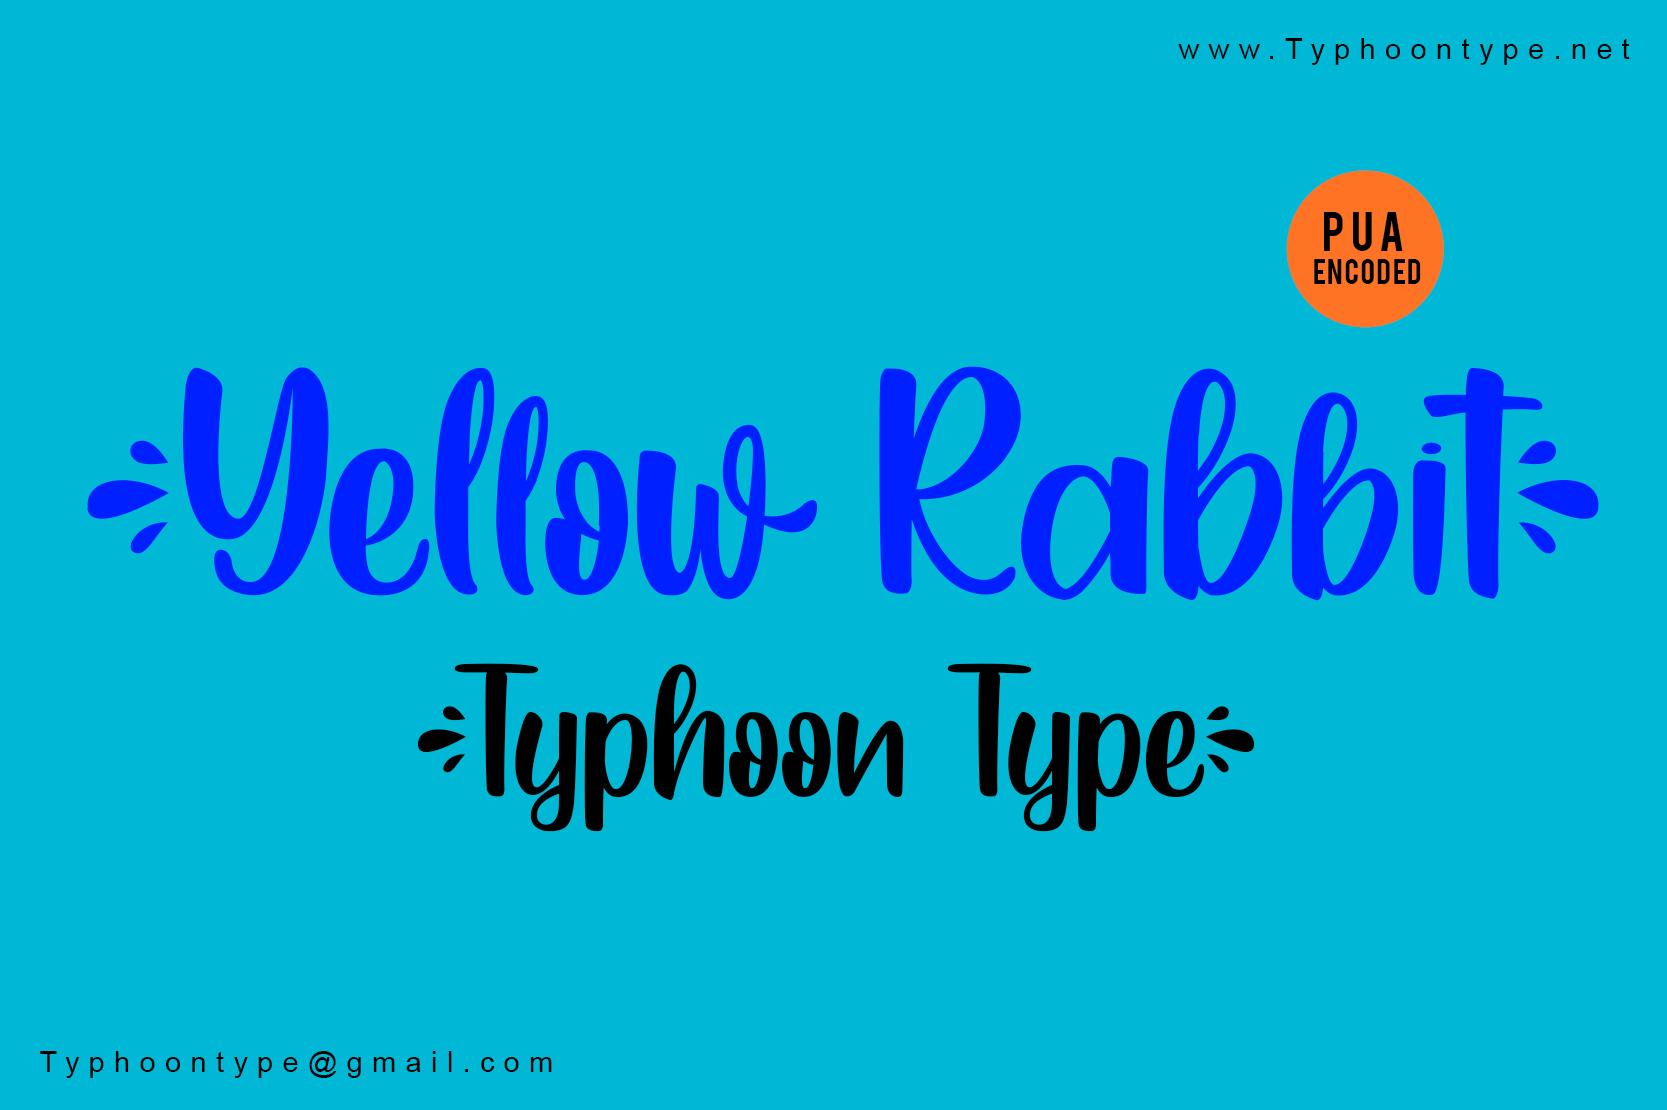 Yellow-Rabbit-Fonts-4201924-2